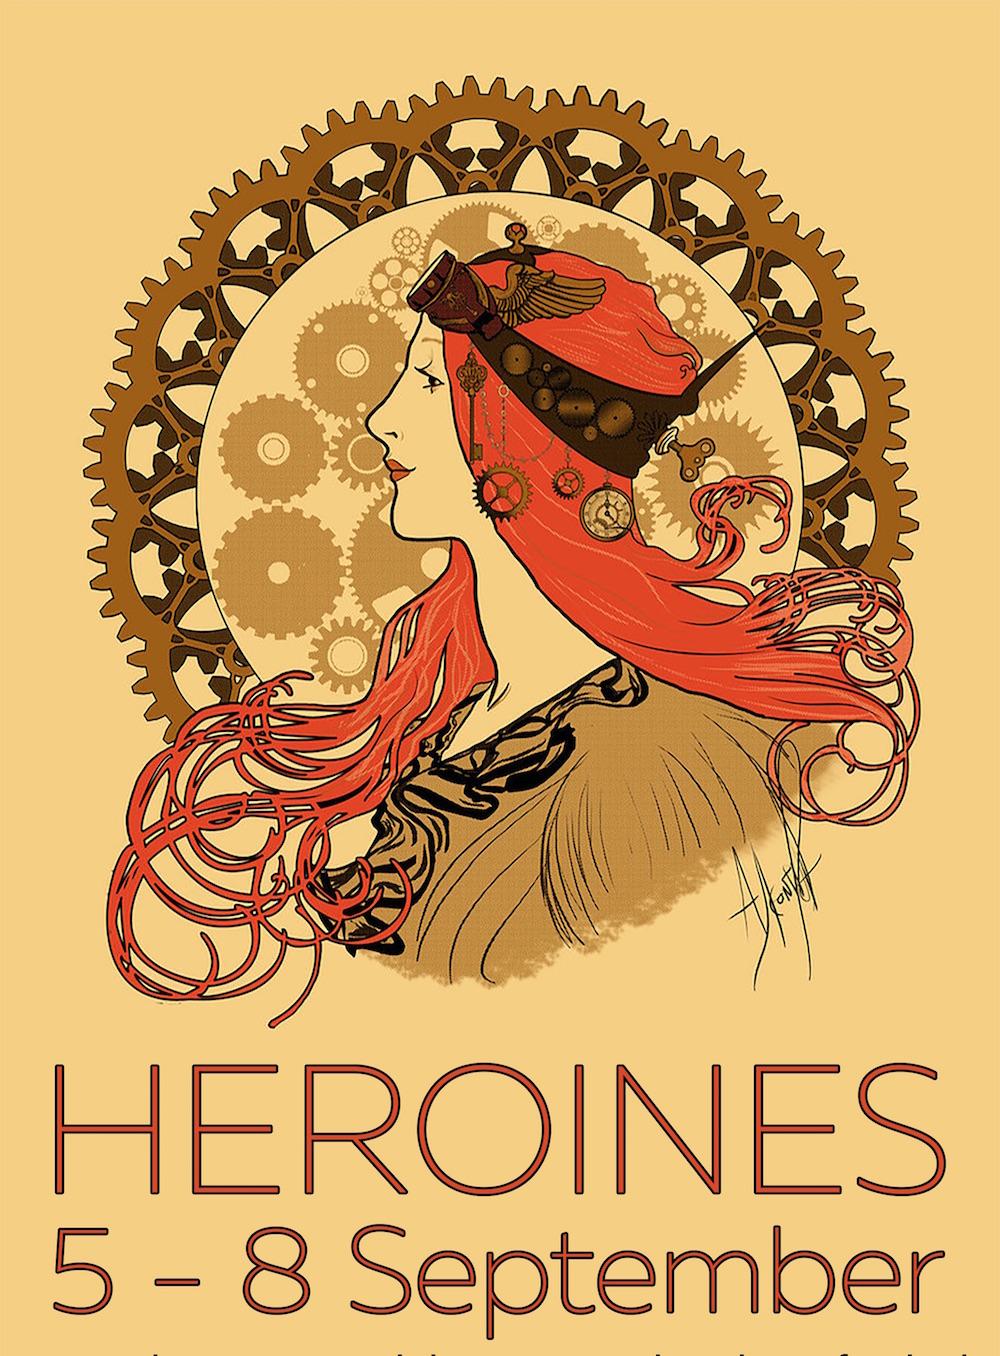 Heroines logo.jpg